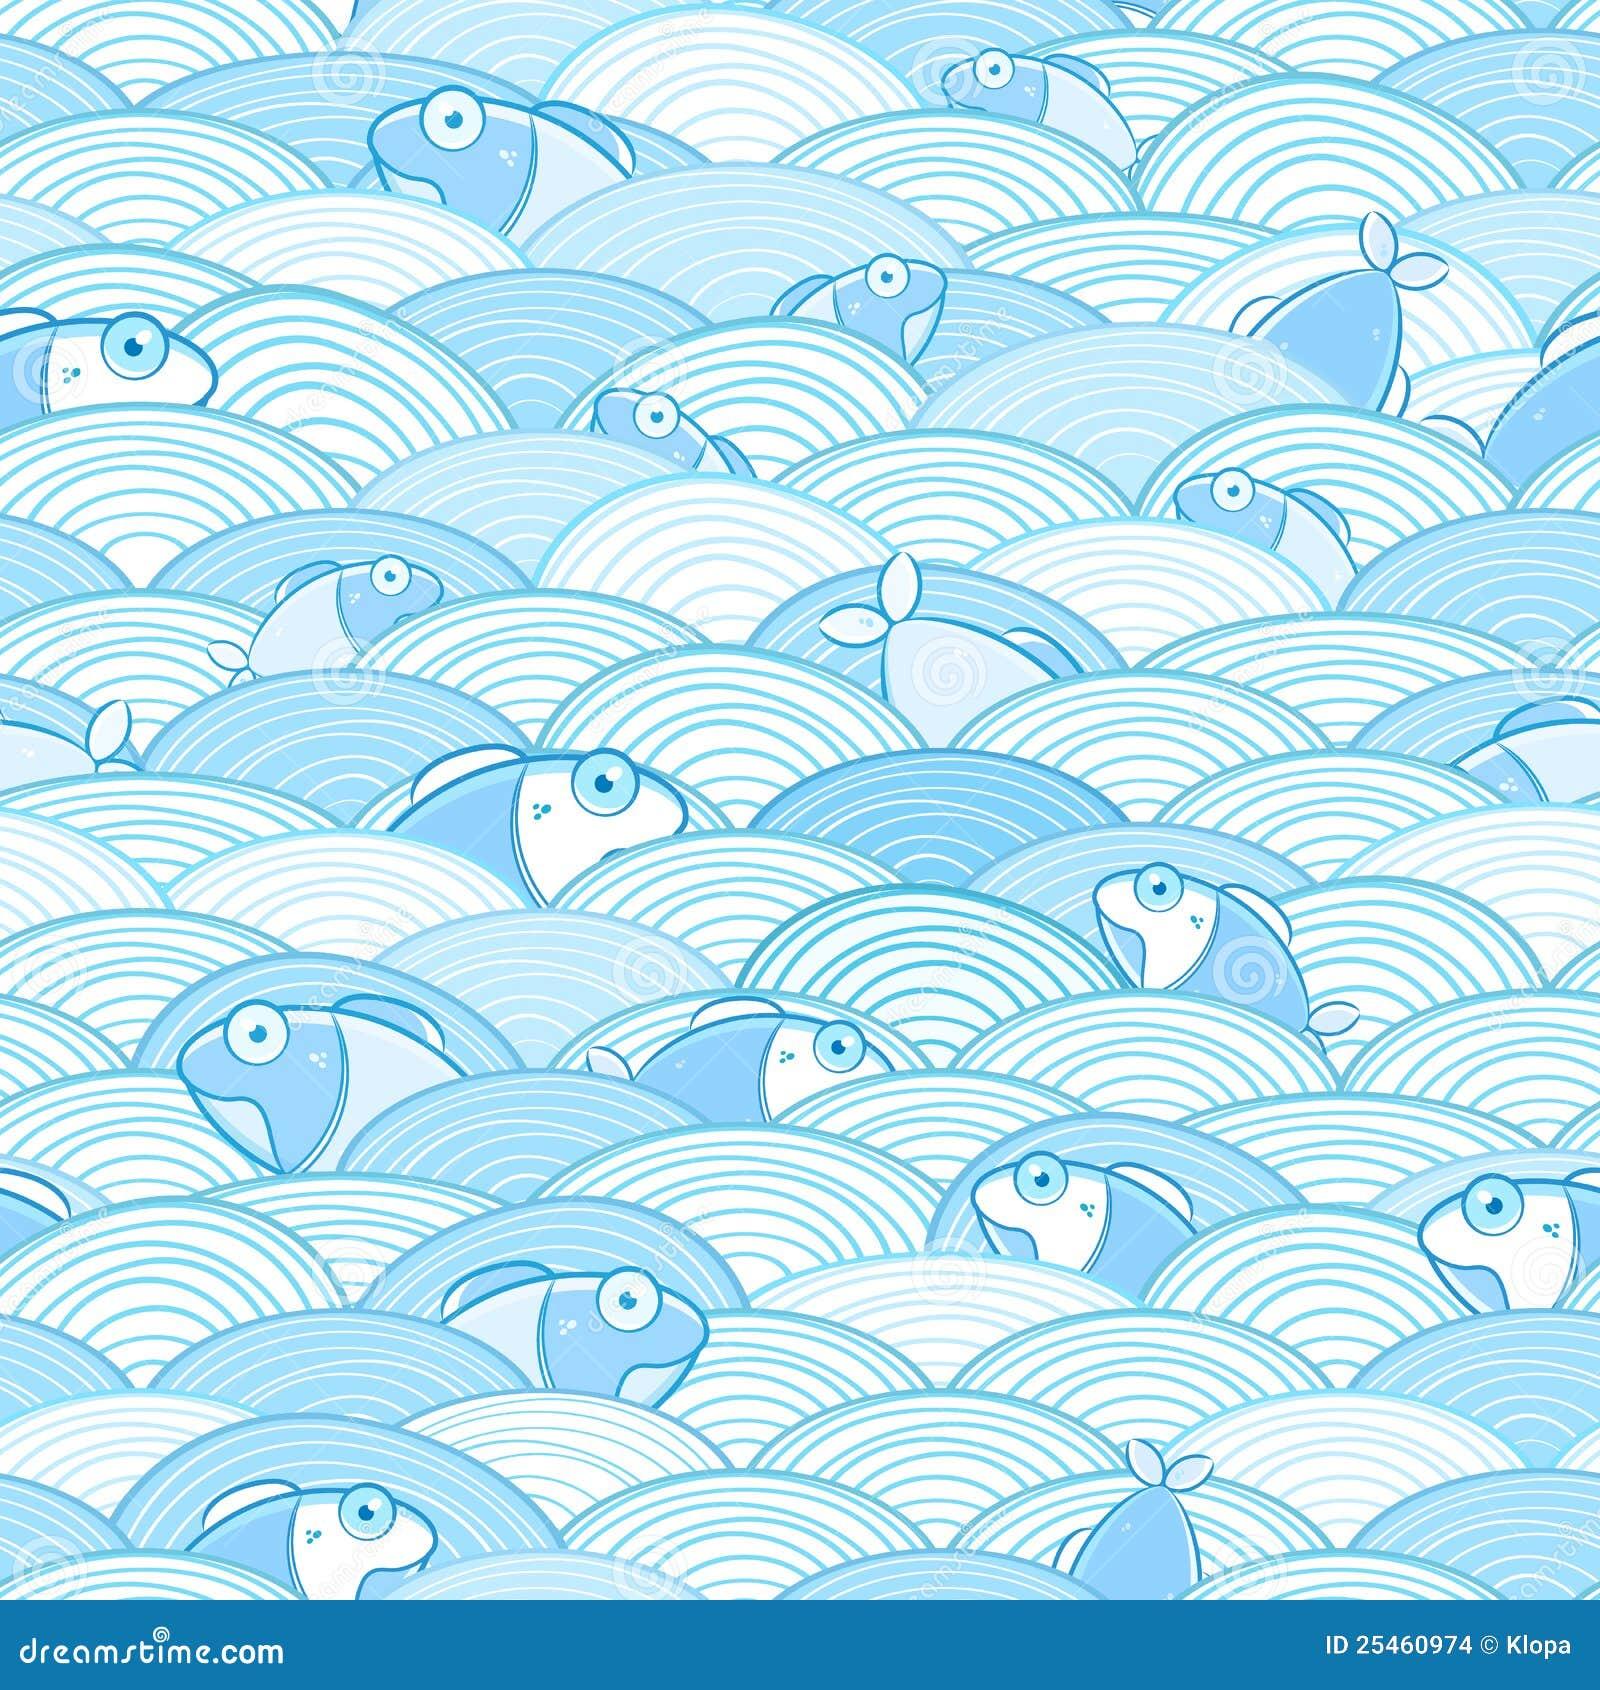 ocean fish wallpaper pattern - photo #20